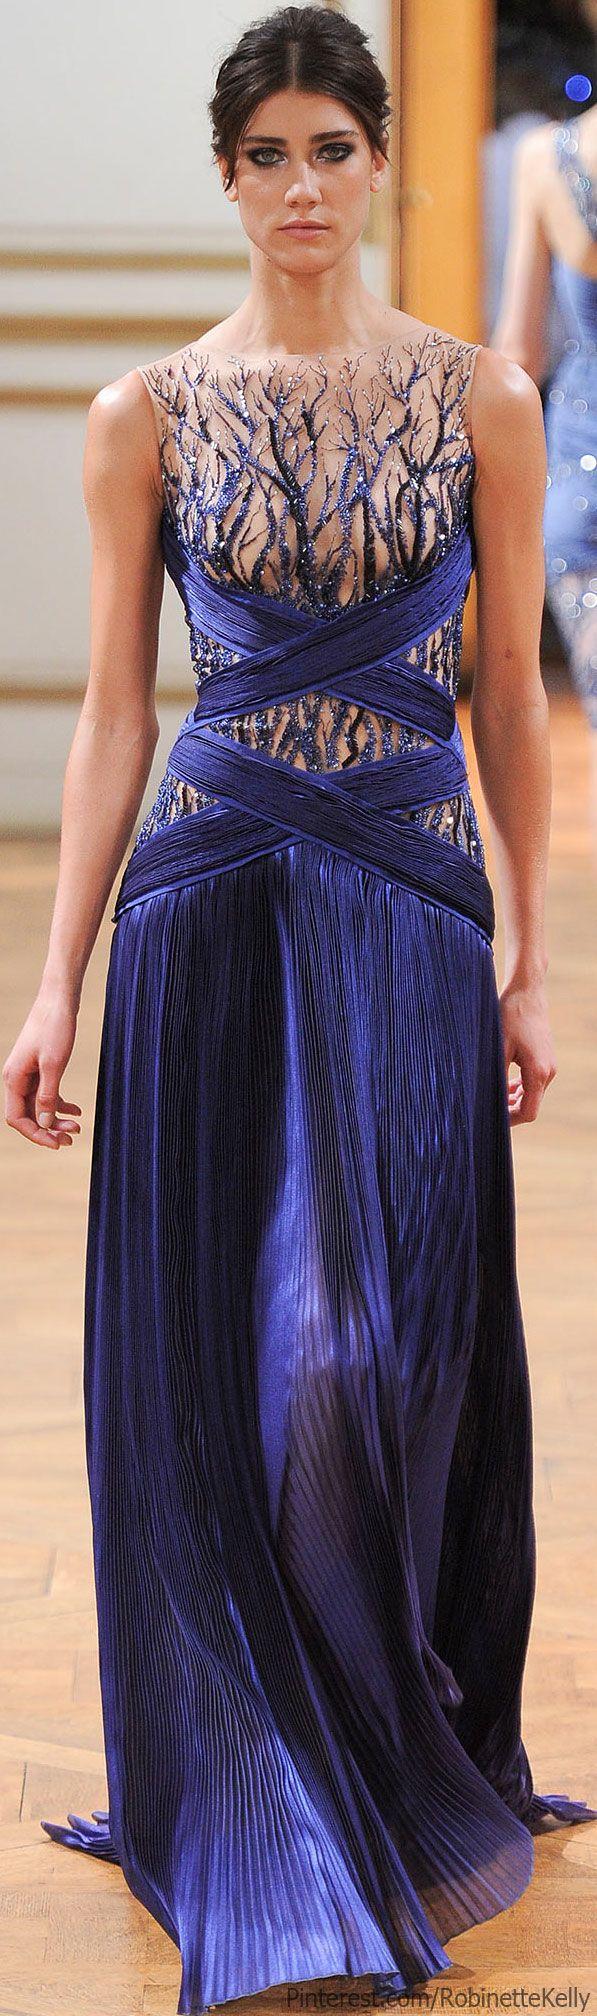 best mannequins images on pinterest night out dresses formal